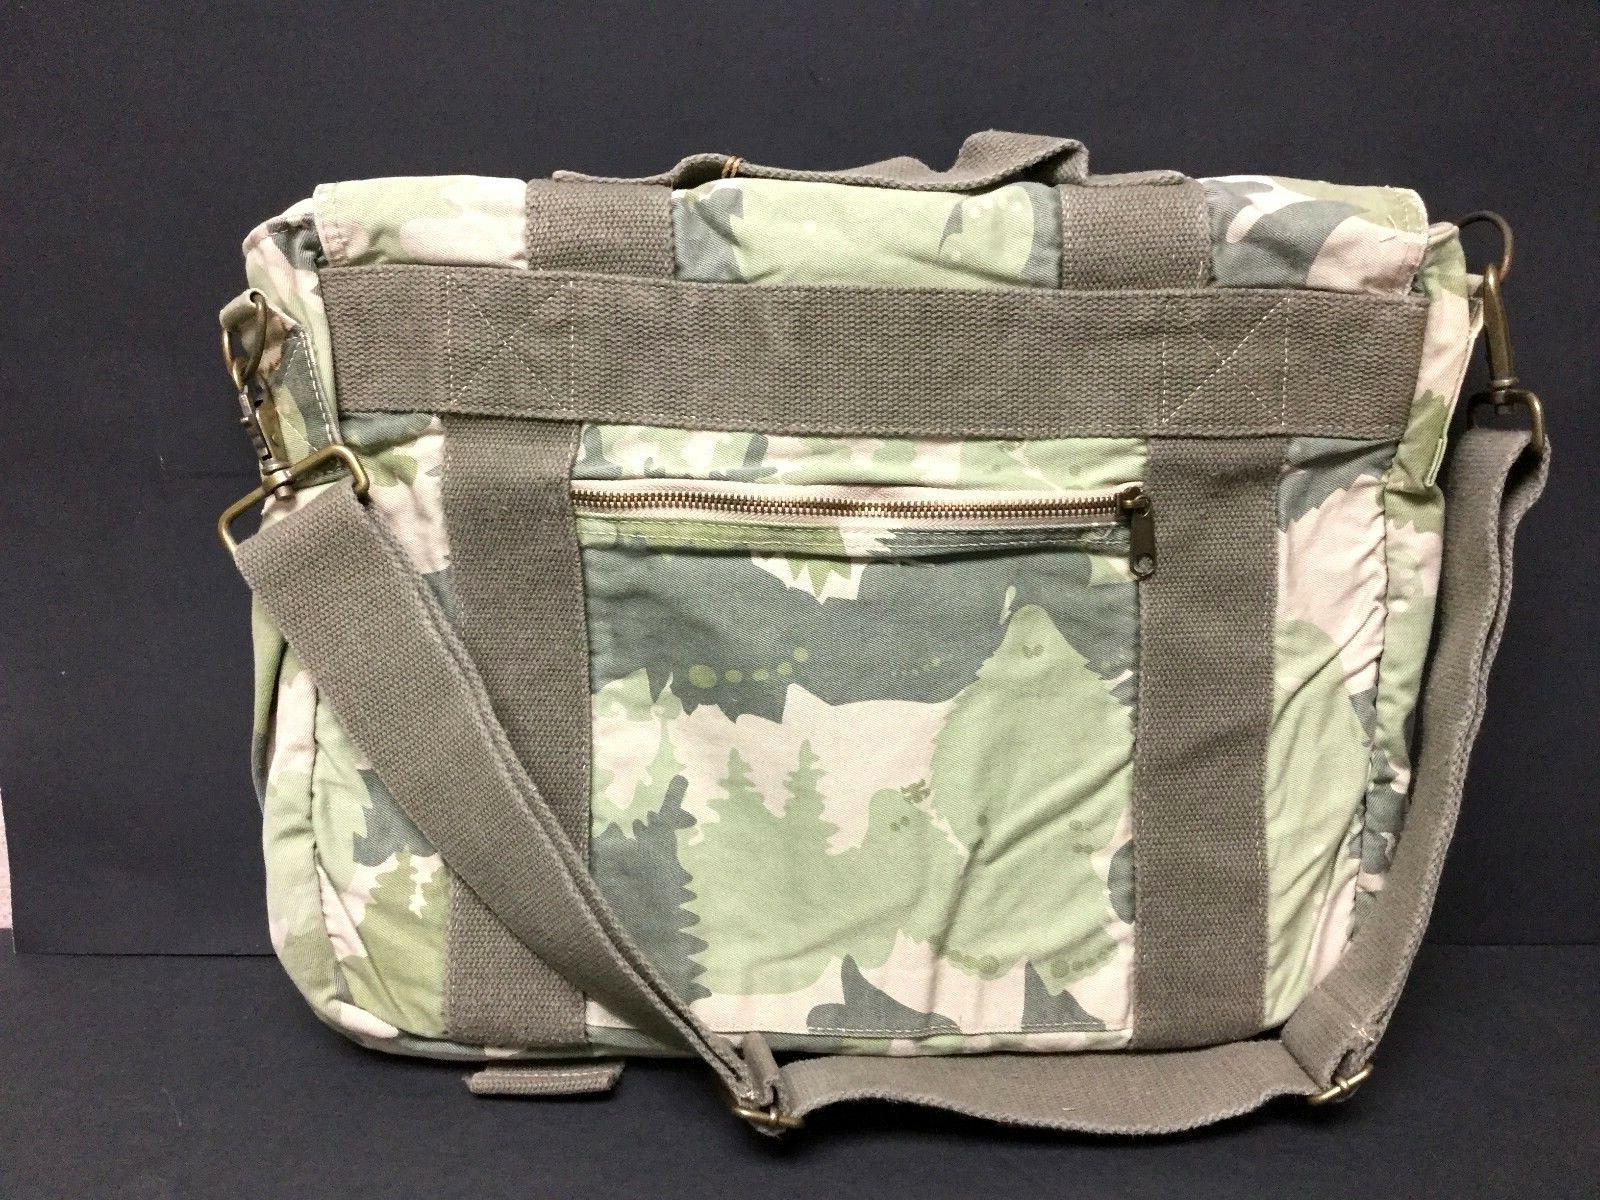 IPath Laptop Bag Case Briefcase